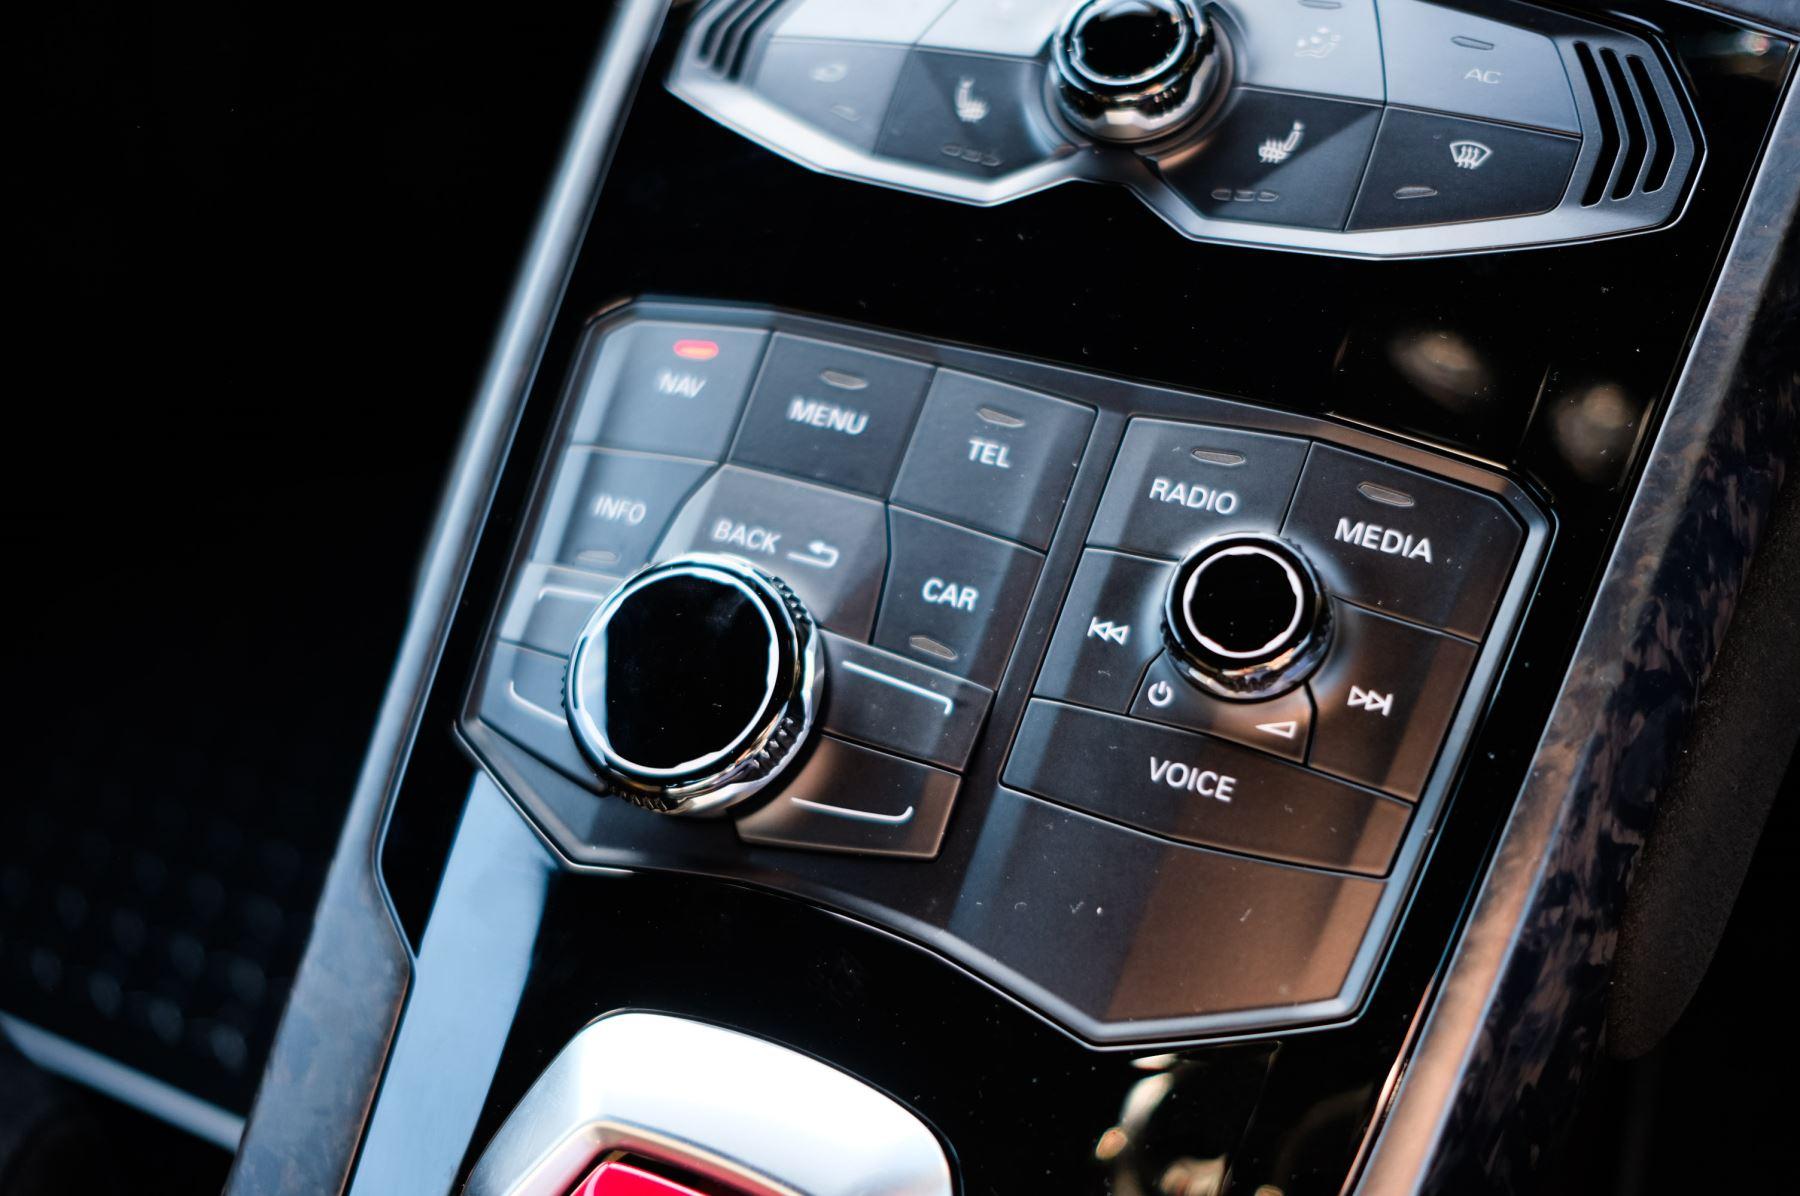 Lamborghini Huracan Performante LP 640-4 2dr LDF - Carbon Ceramic Brakes - Carbon Fiber Features - Comfort Seats image 18